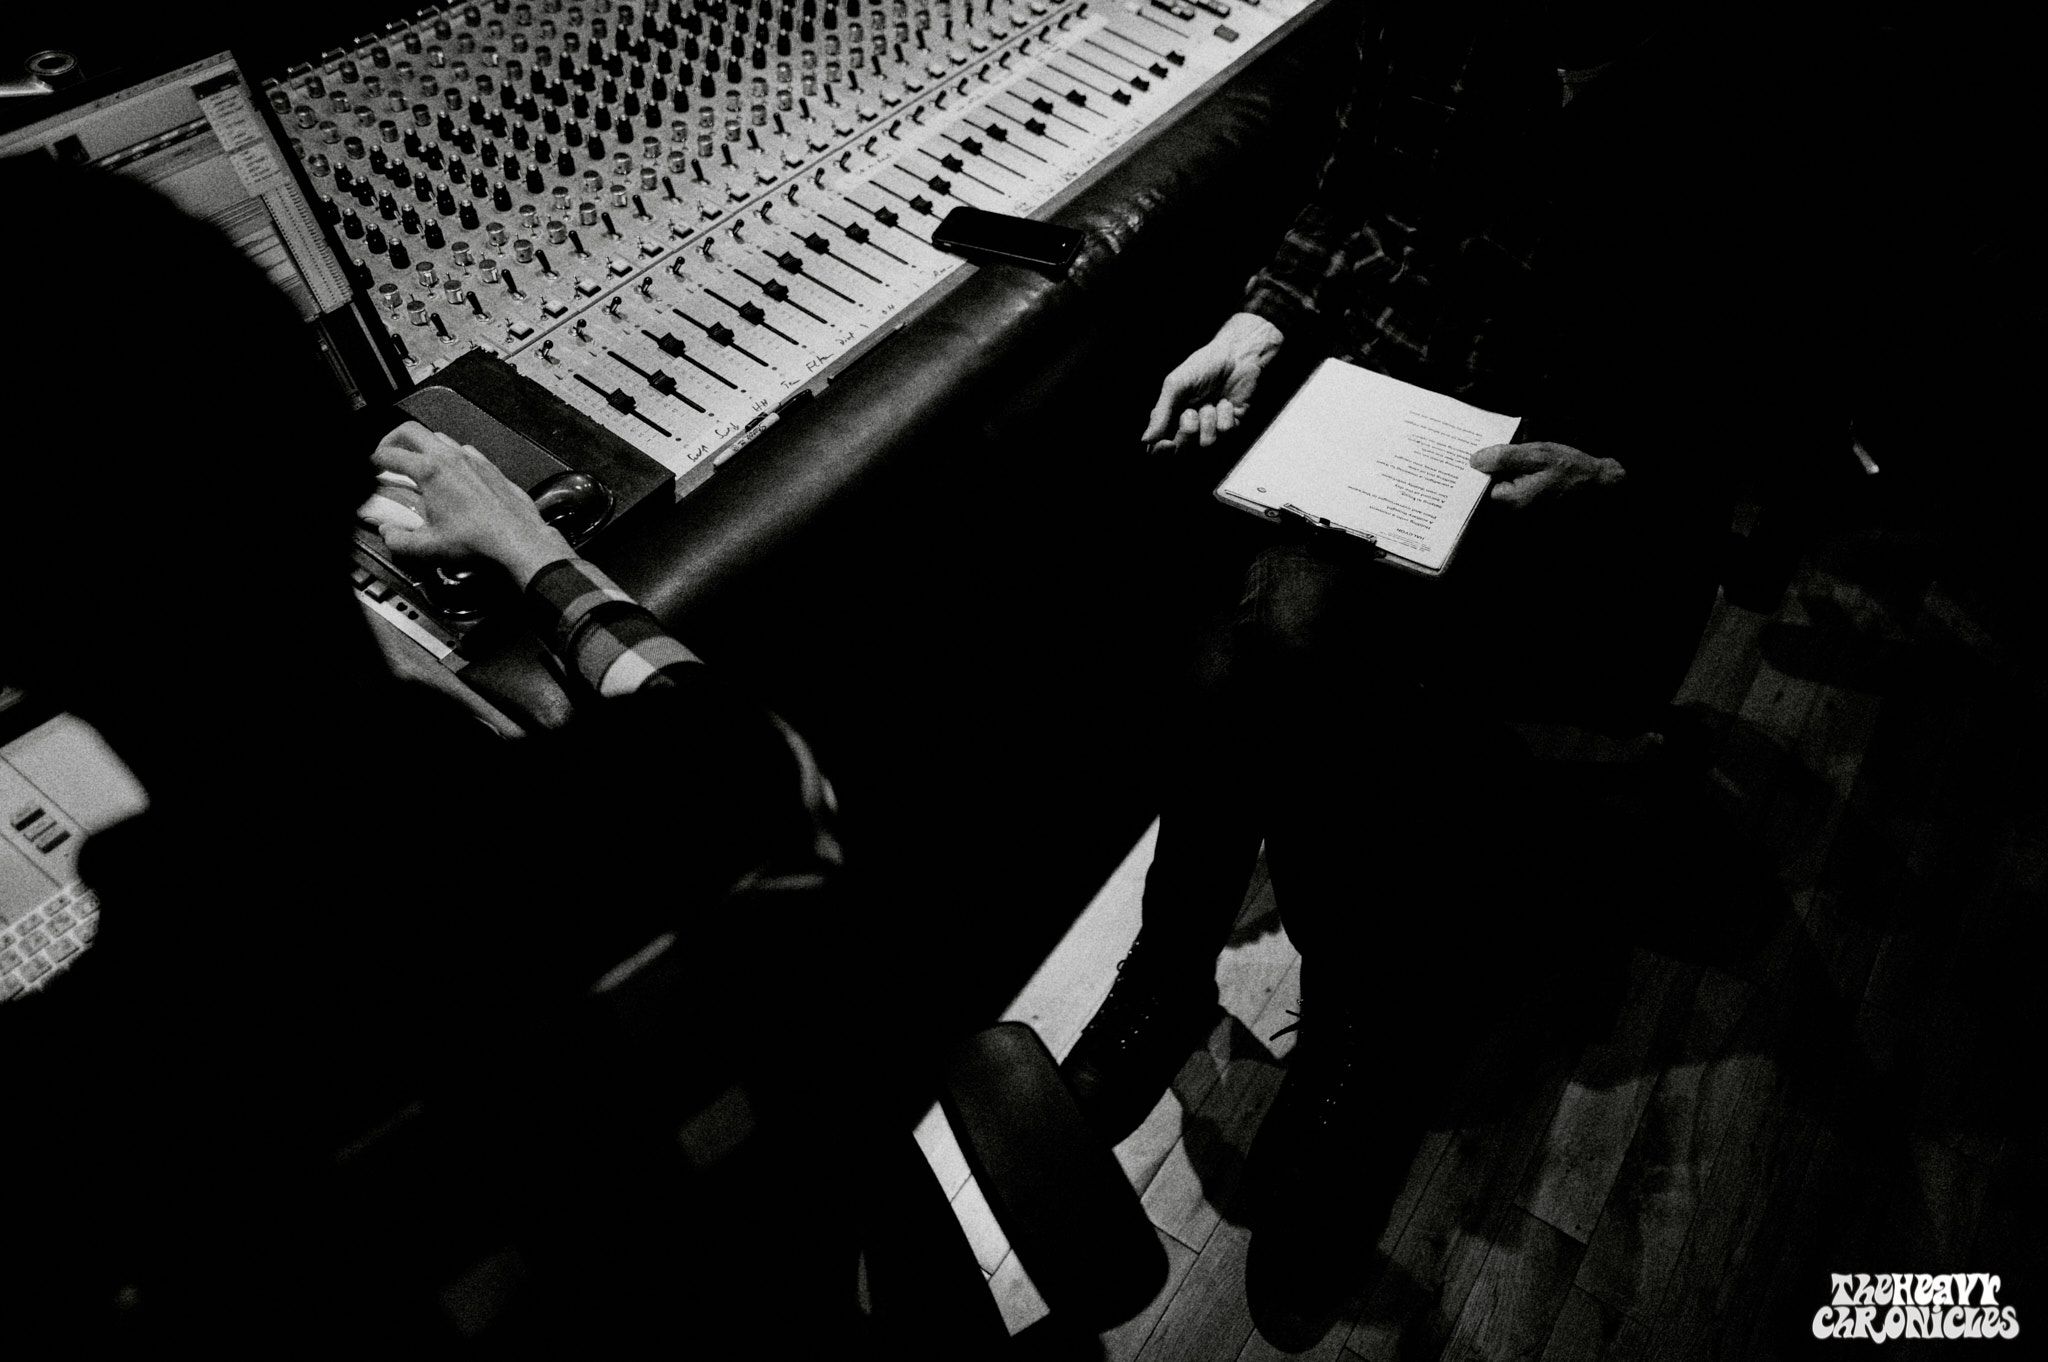 Elder-Studio-Black-Box-2019-Gael-Mathieu-The-Heavy-Chronicles-29